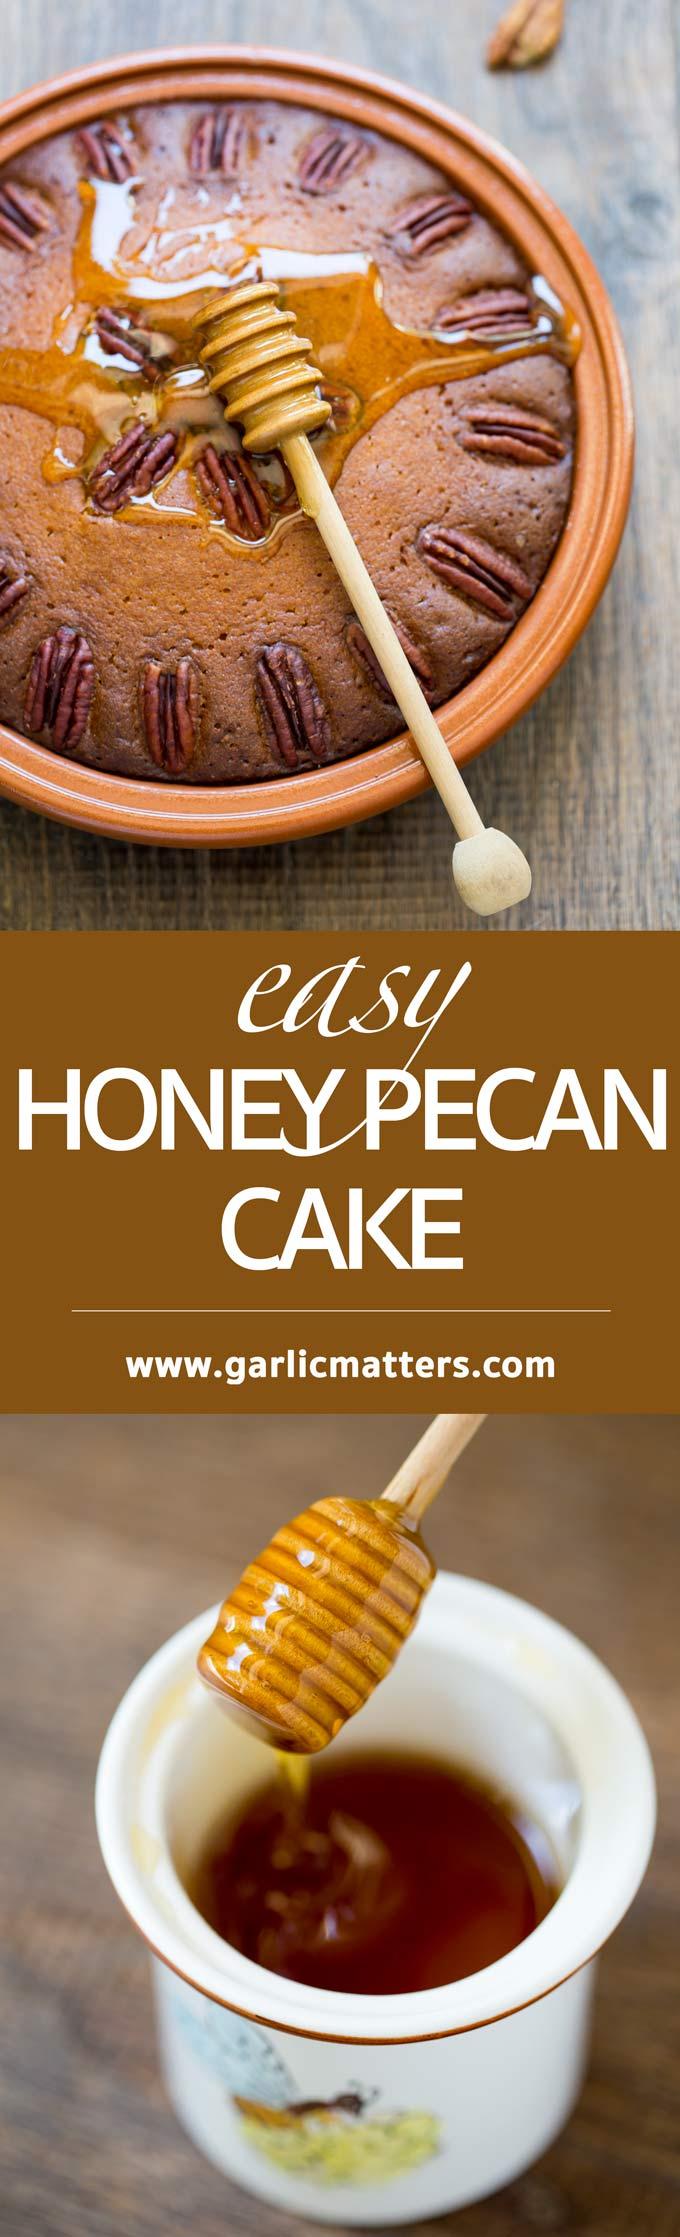 HONEY PECAN CAKE | GARLIC MATTERS